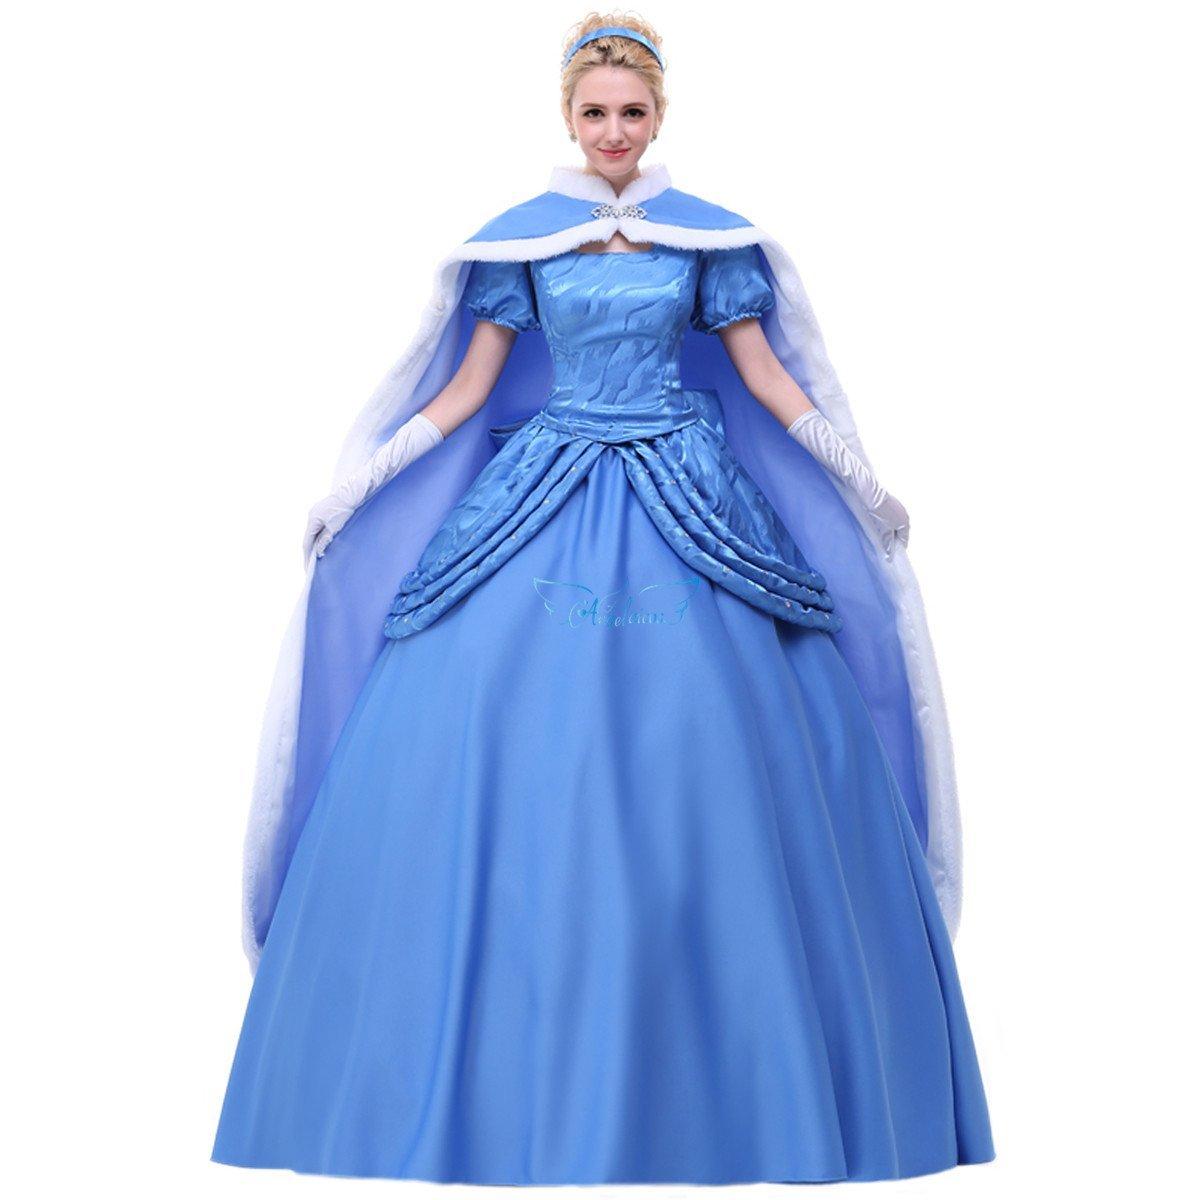 Angelaicos Womens Handmade Party Elegant Costume Dresses Cloak Petticoat (L, Satin Royal Blue) by Angelaicos